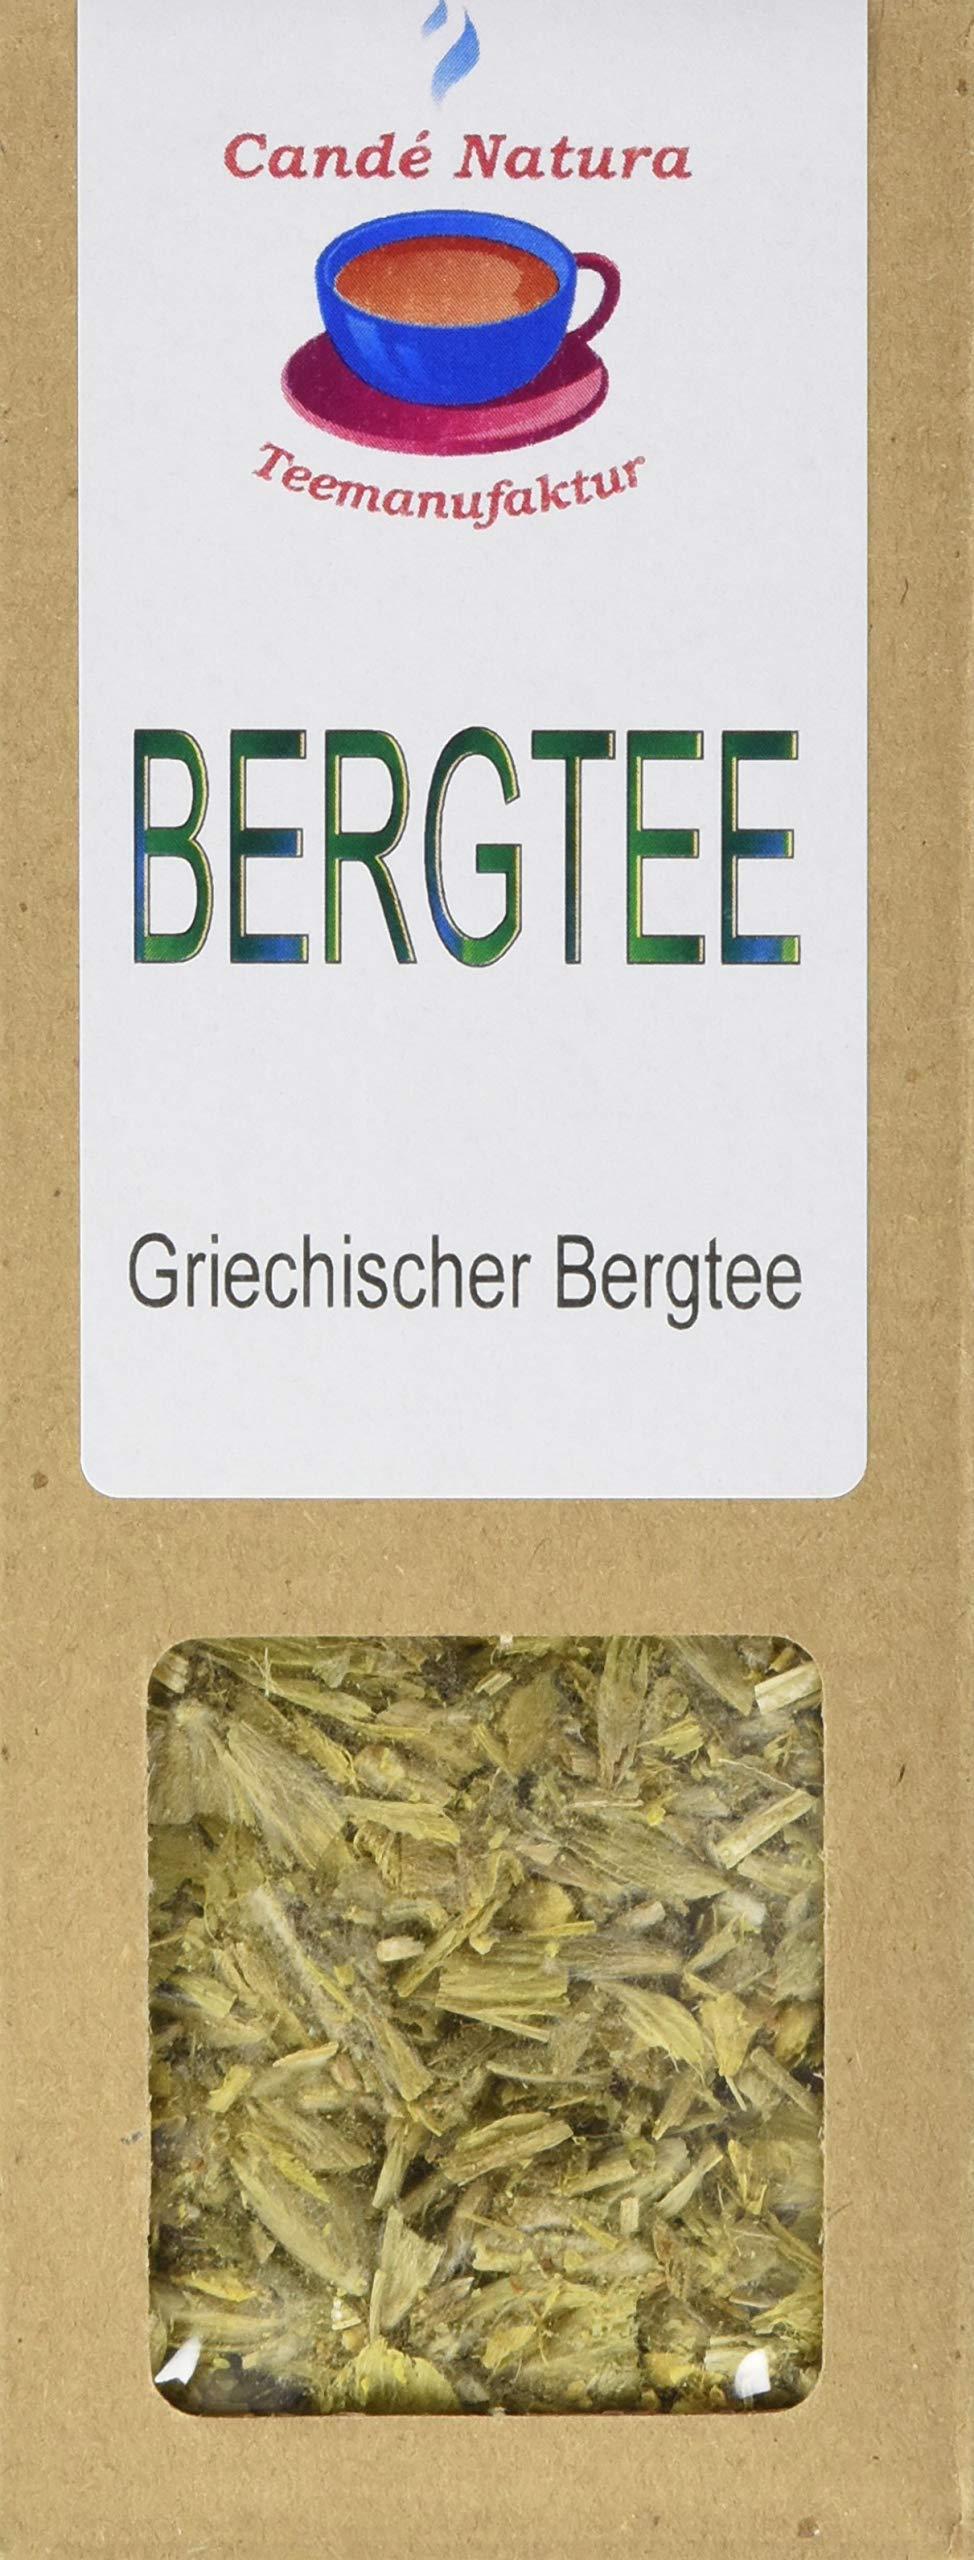 Cand-Natura-Teemanufaktur-Bergtee-pur-5er-Pack-5-x-25-g